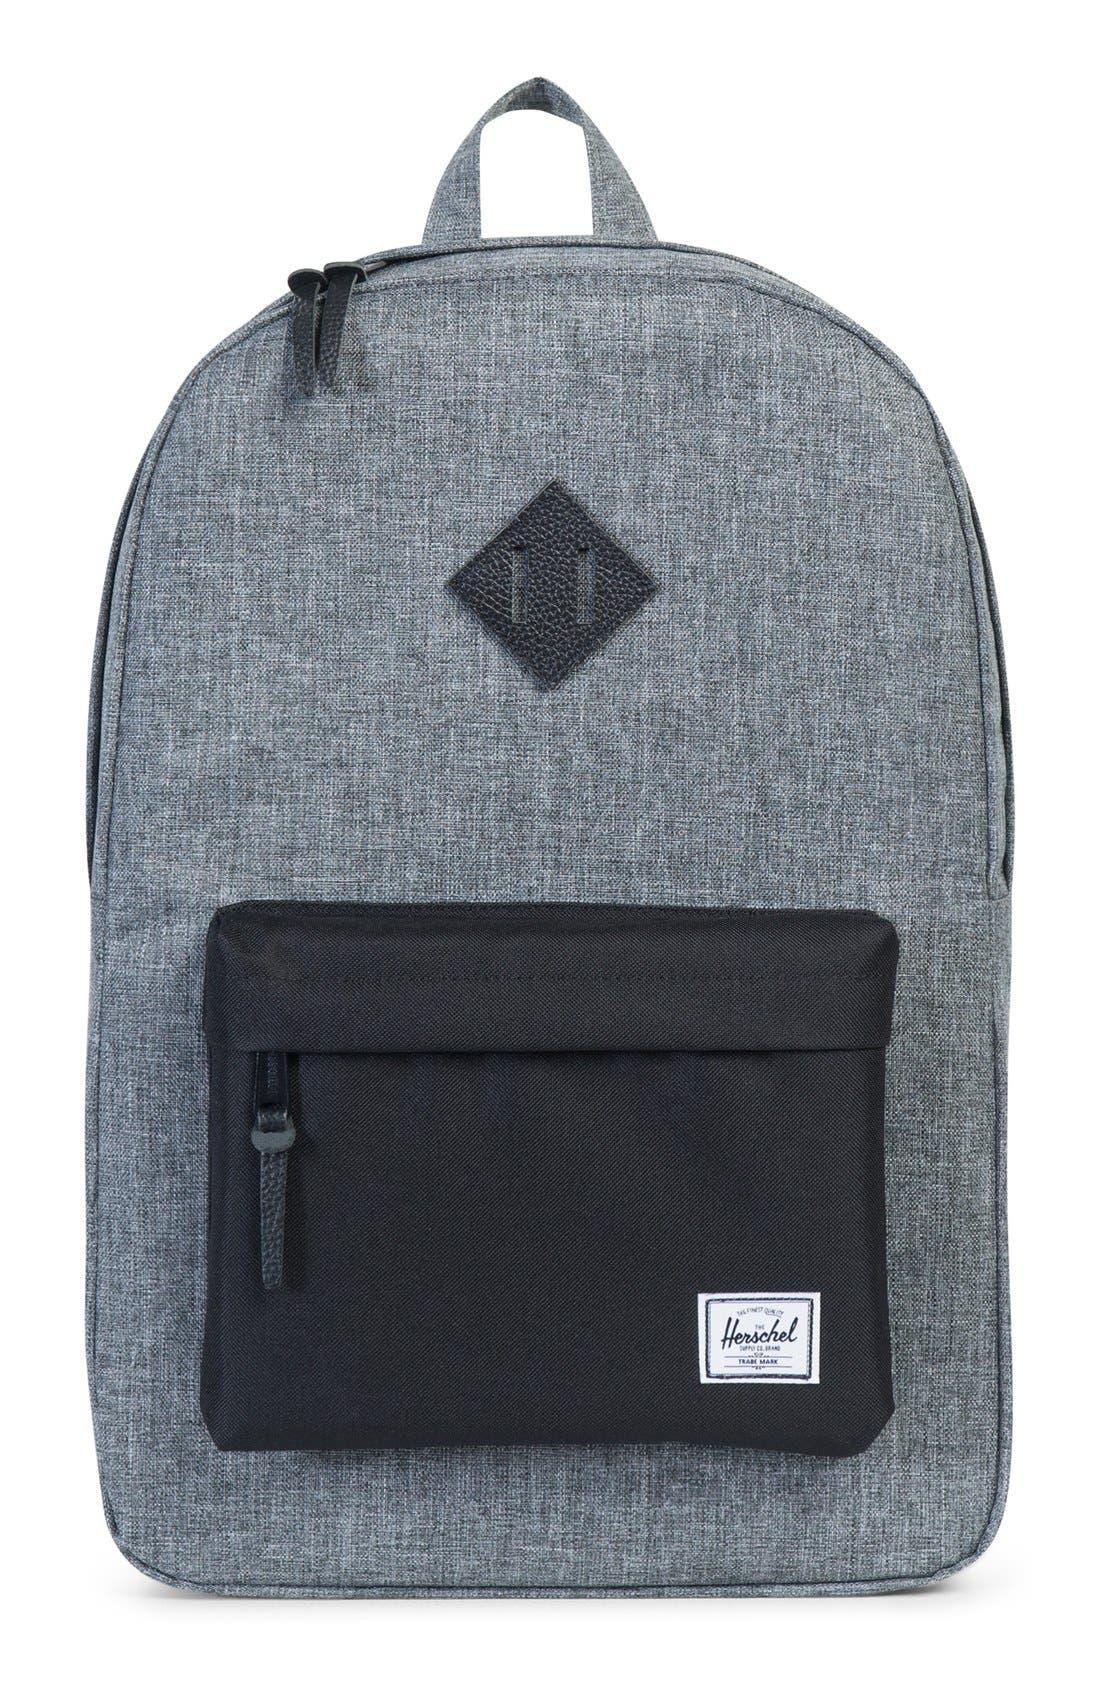 049f67d6756 Backpacks Herschel Backpacks, Bags,   Wallets   Nordstrom